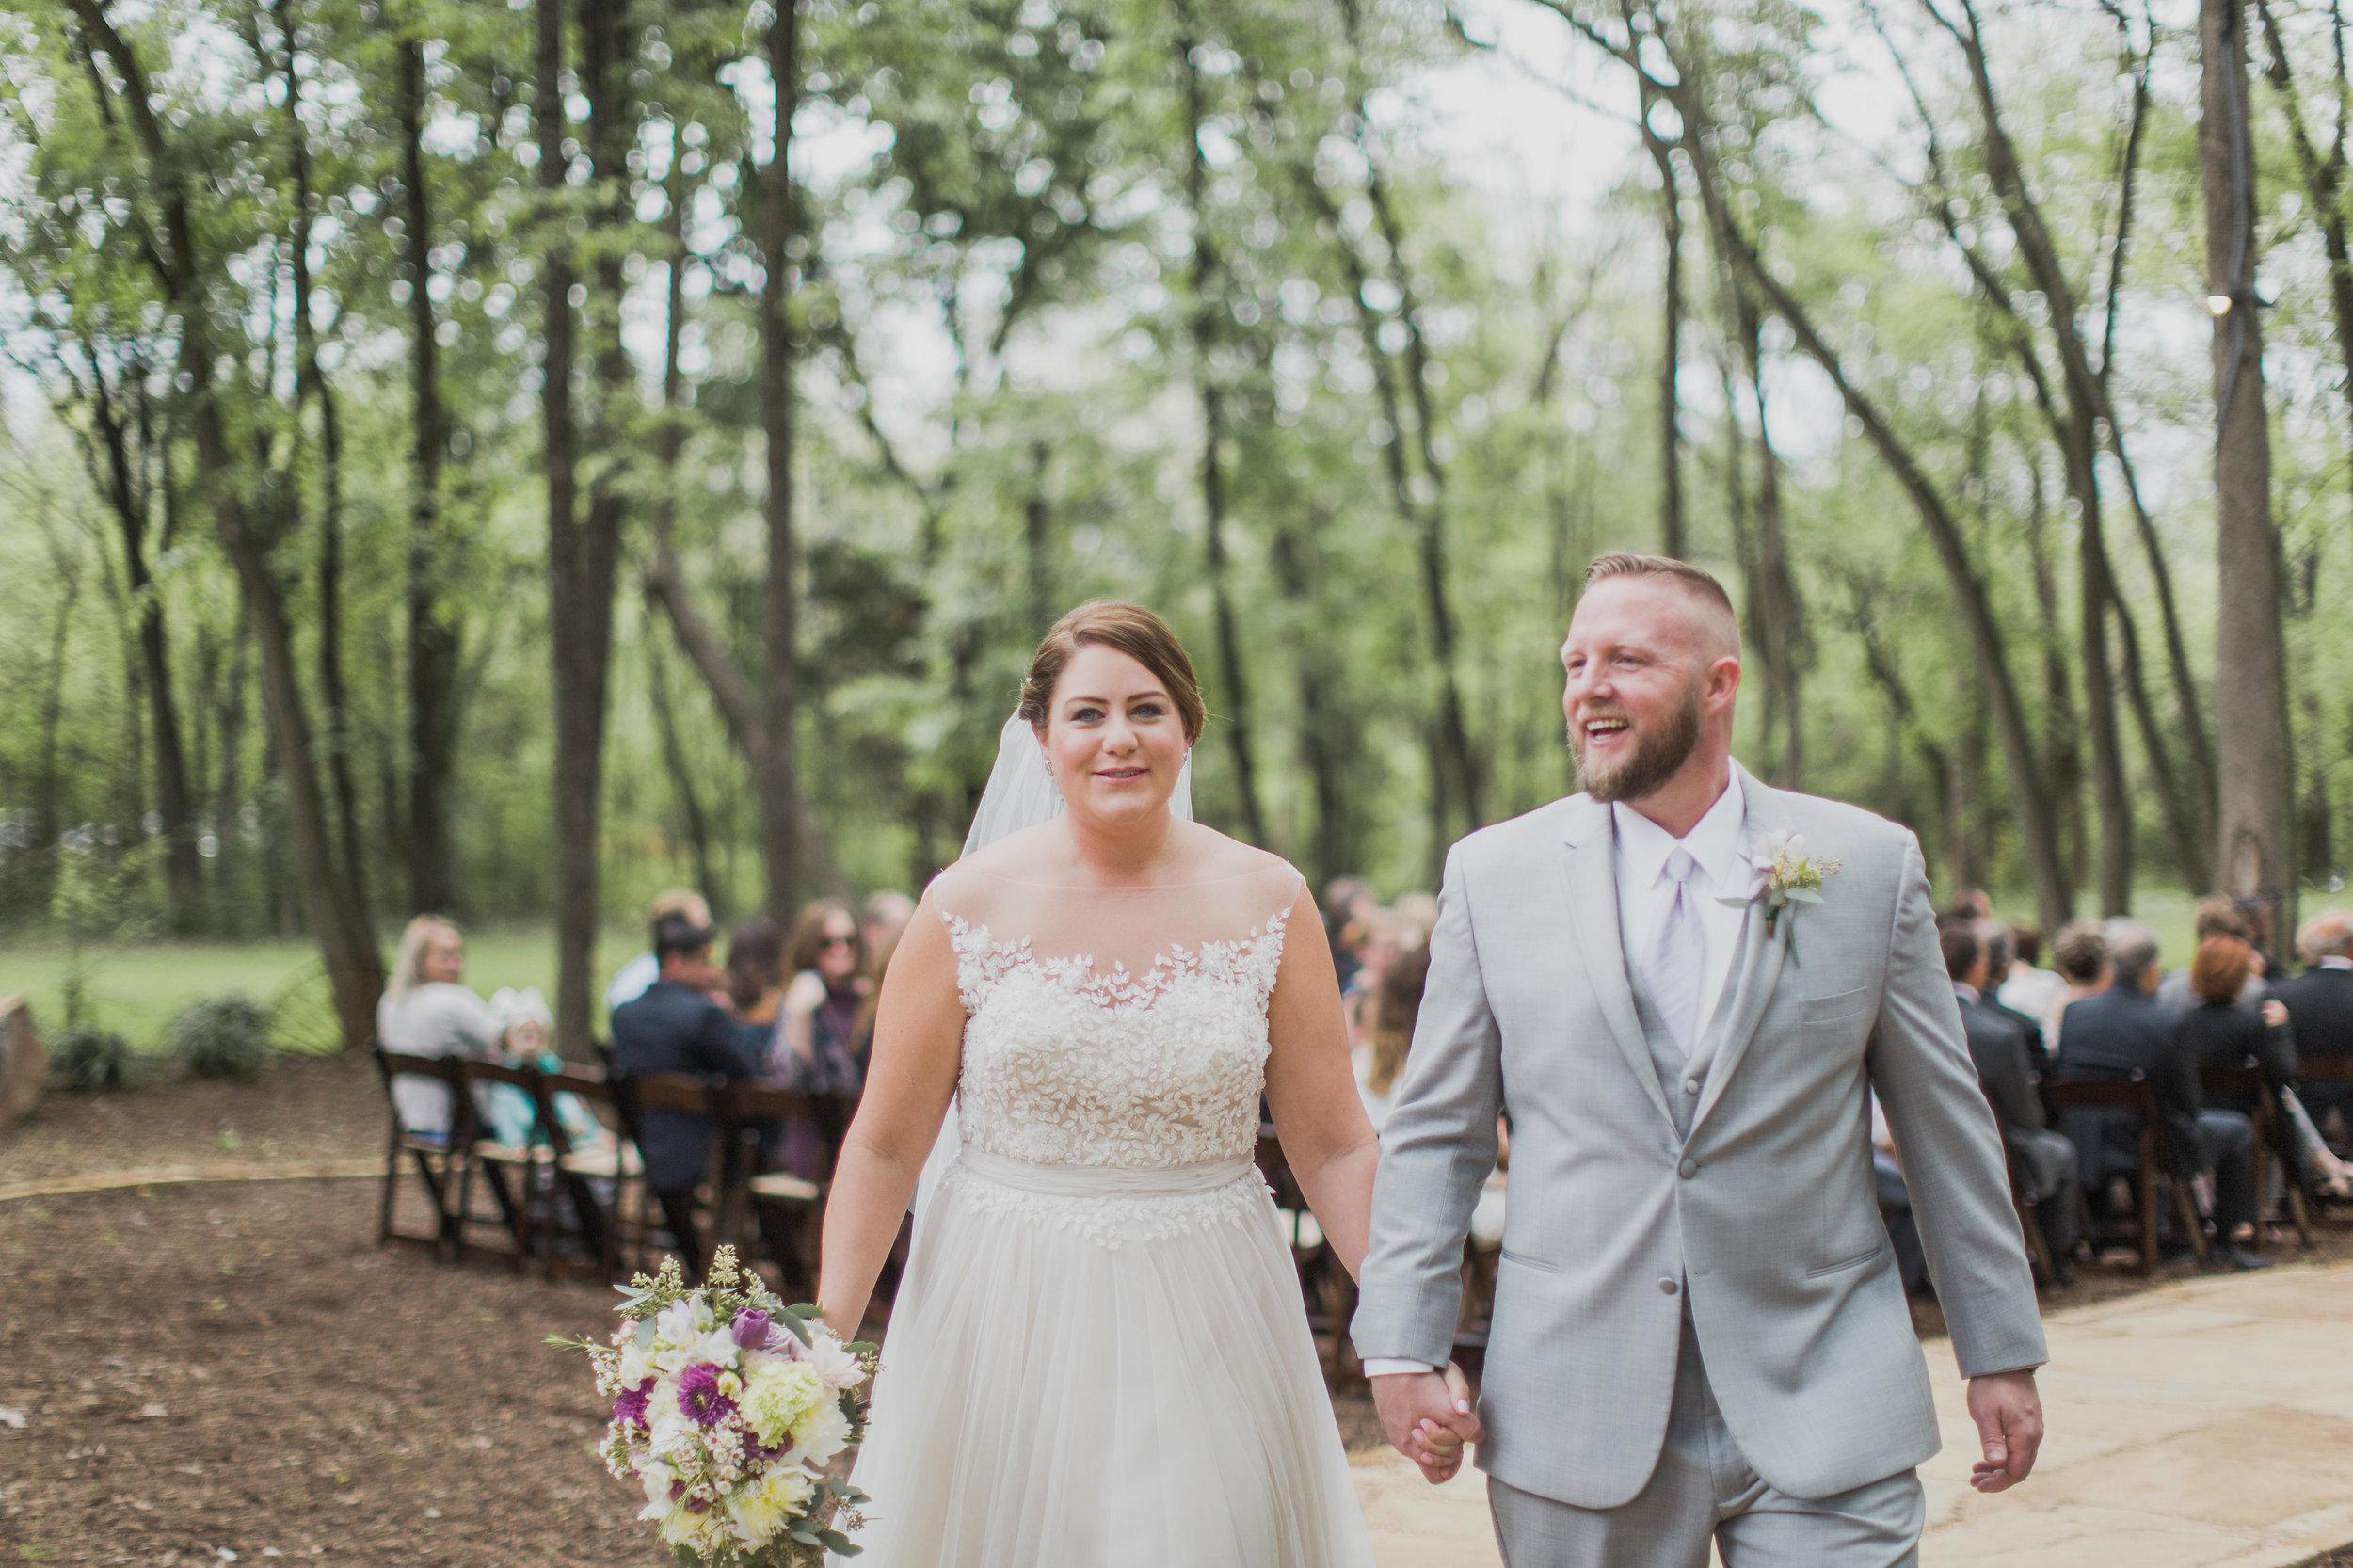 nbarrett_rent my dust_wilson wedding (13).jpg